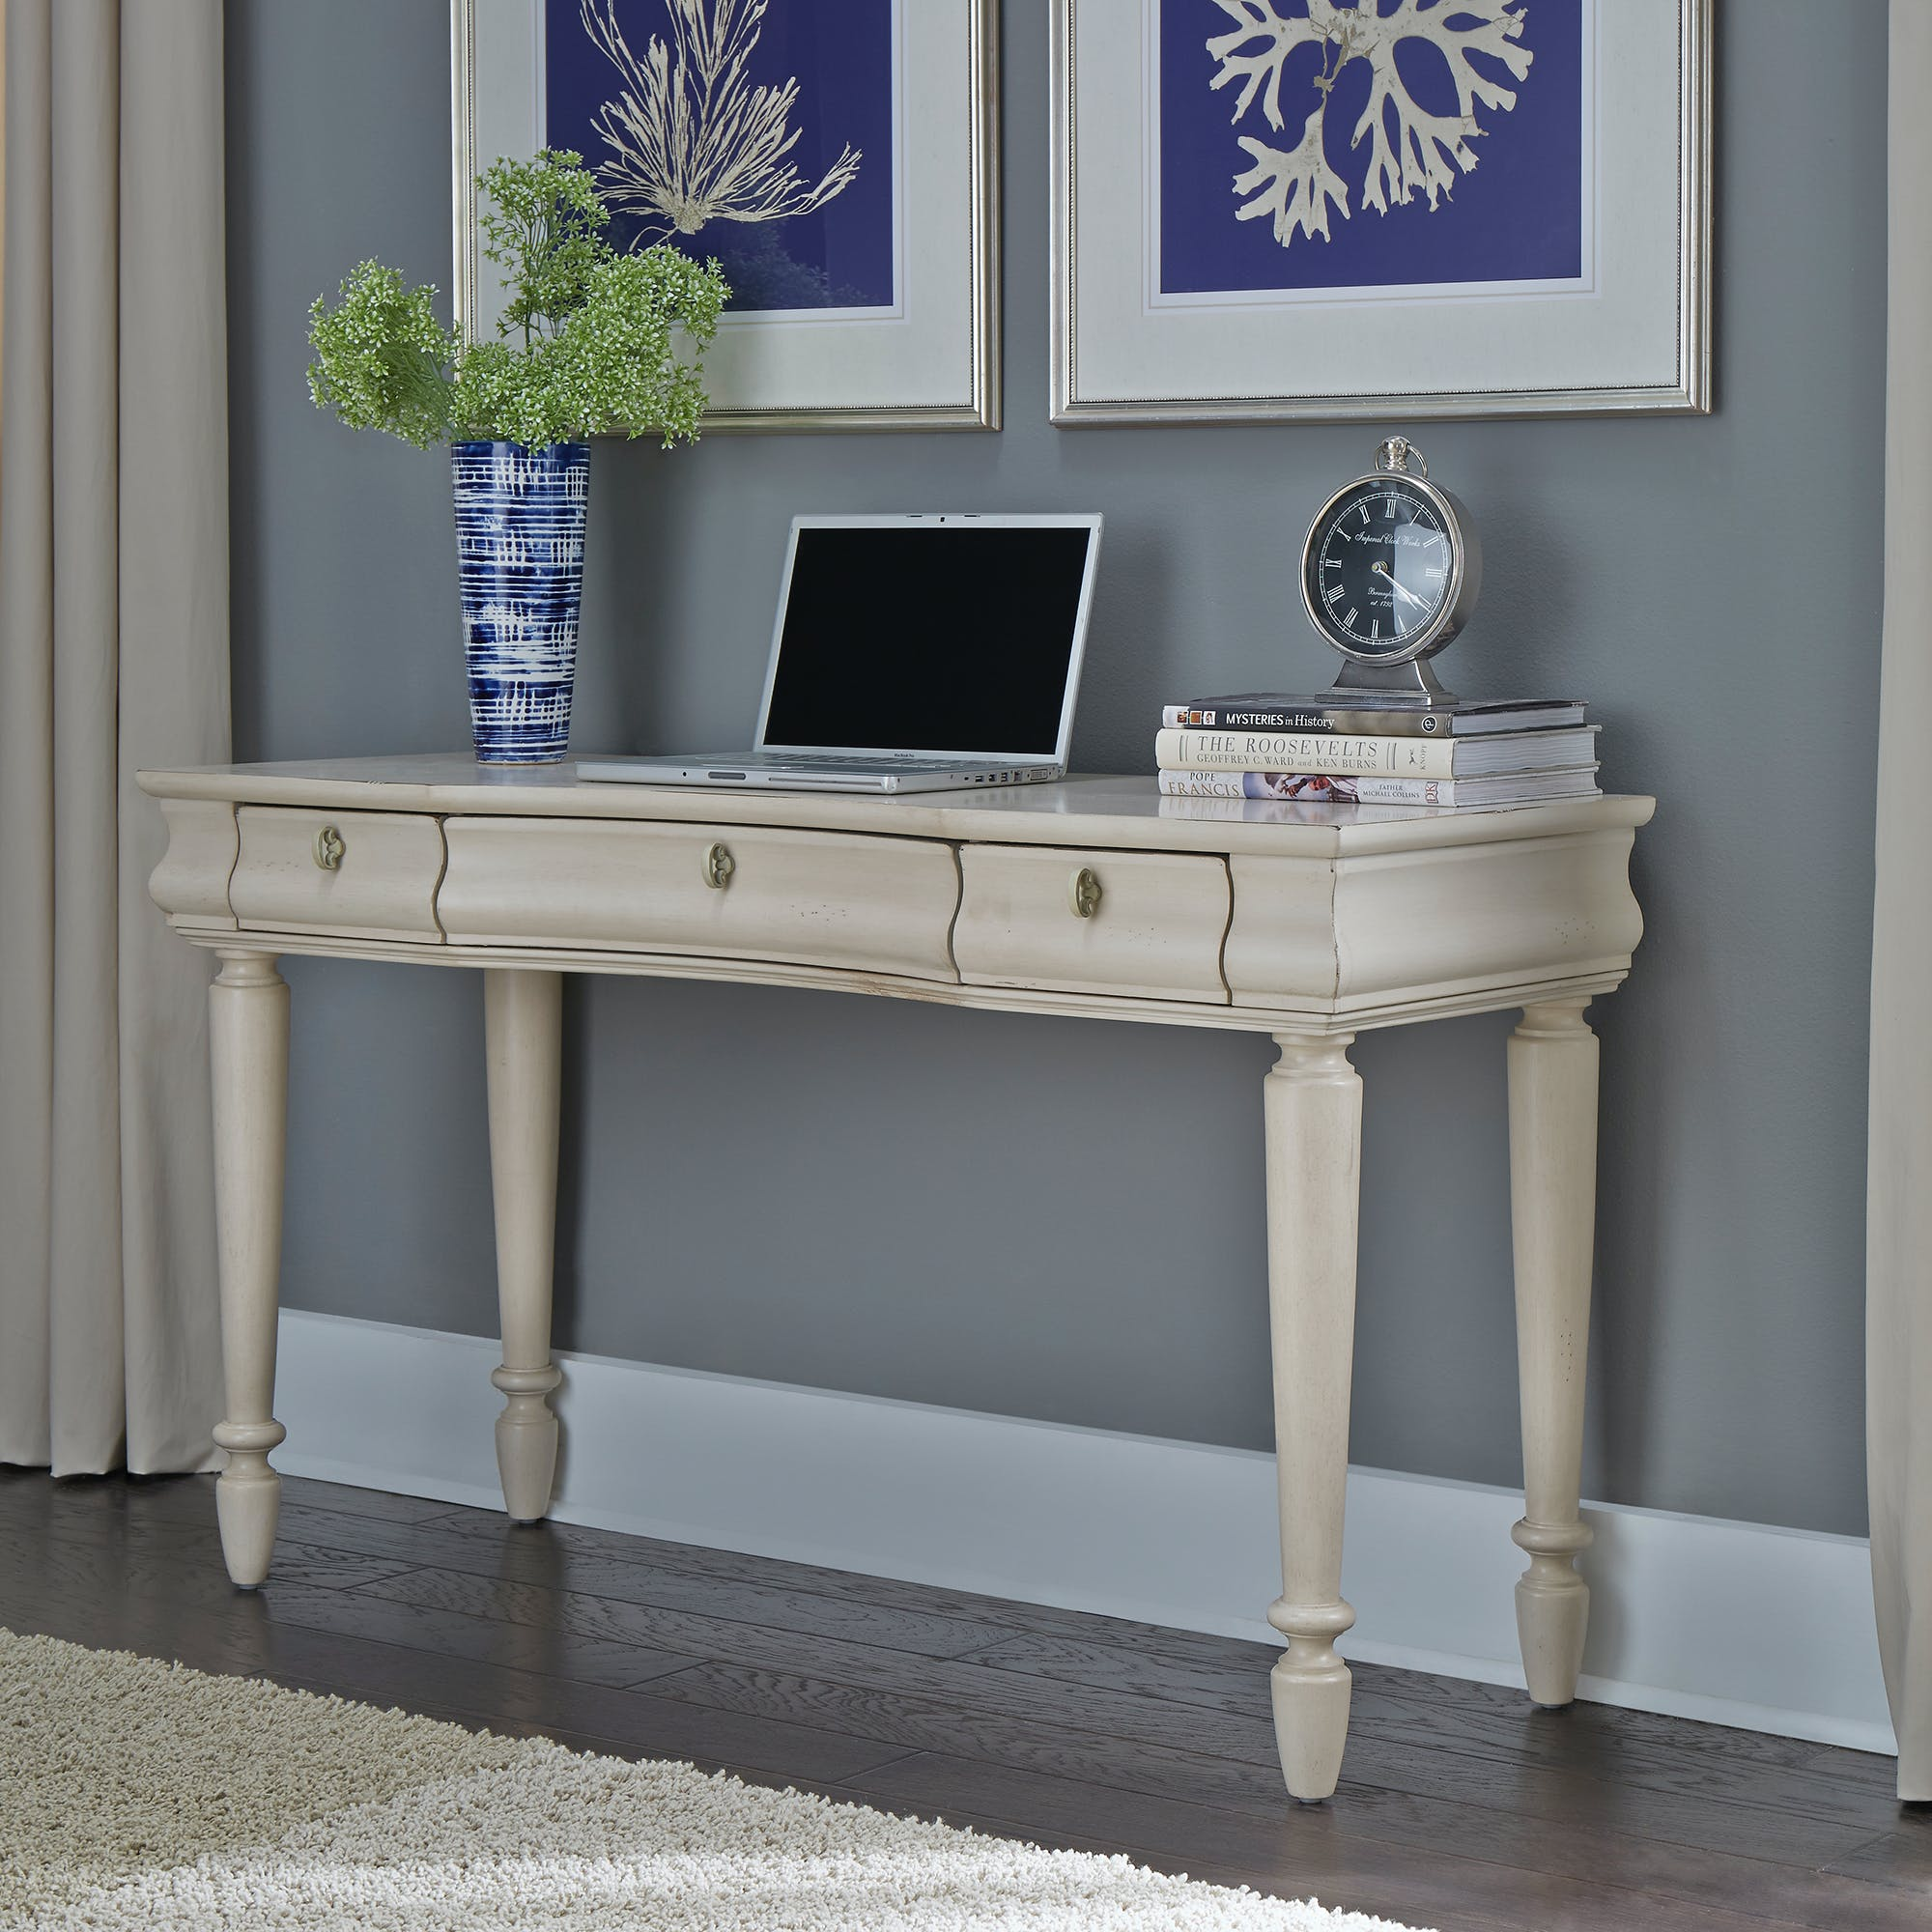 Liberty Furniture Bedroom Vanity Desk 689 Br35 Lynch Furniture Canandaigua Ny